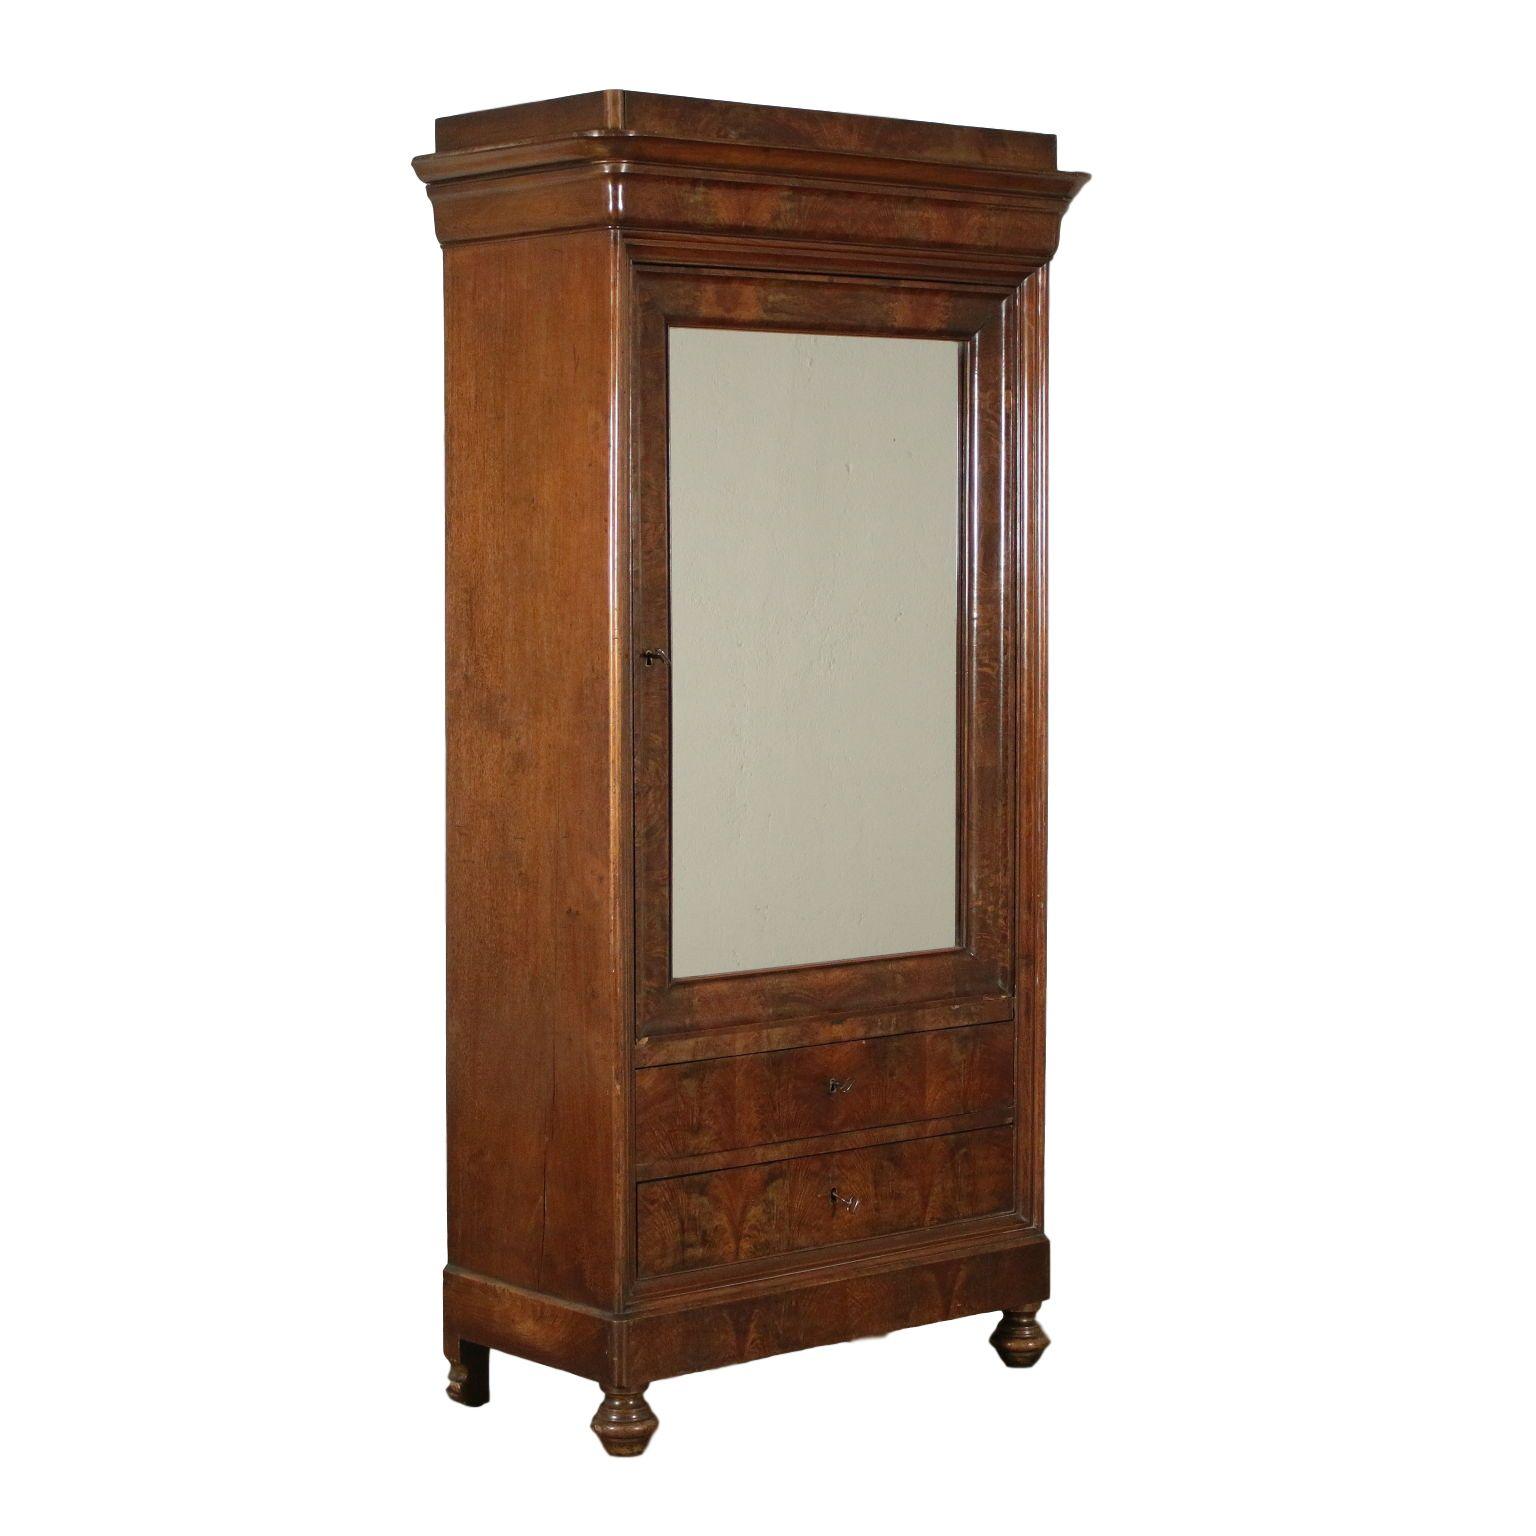 Walnut One Door Cupdoarb Italy 20th Century Armoire Antique Miroir Italie